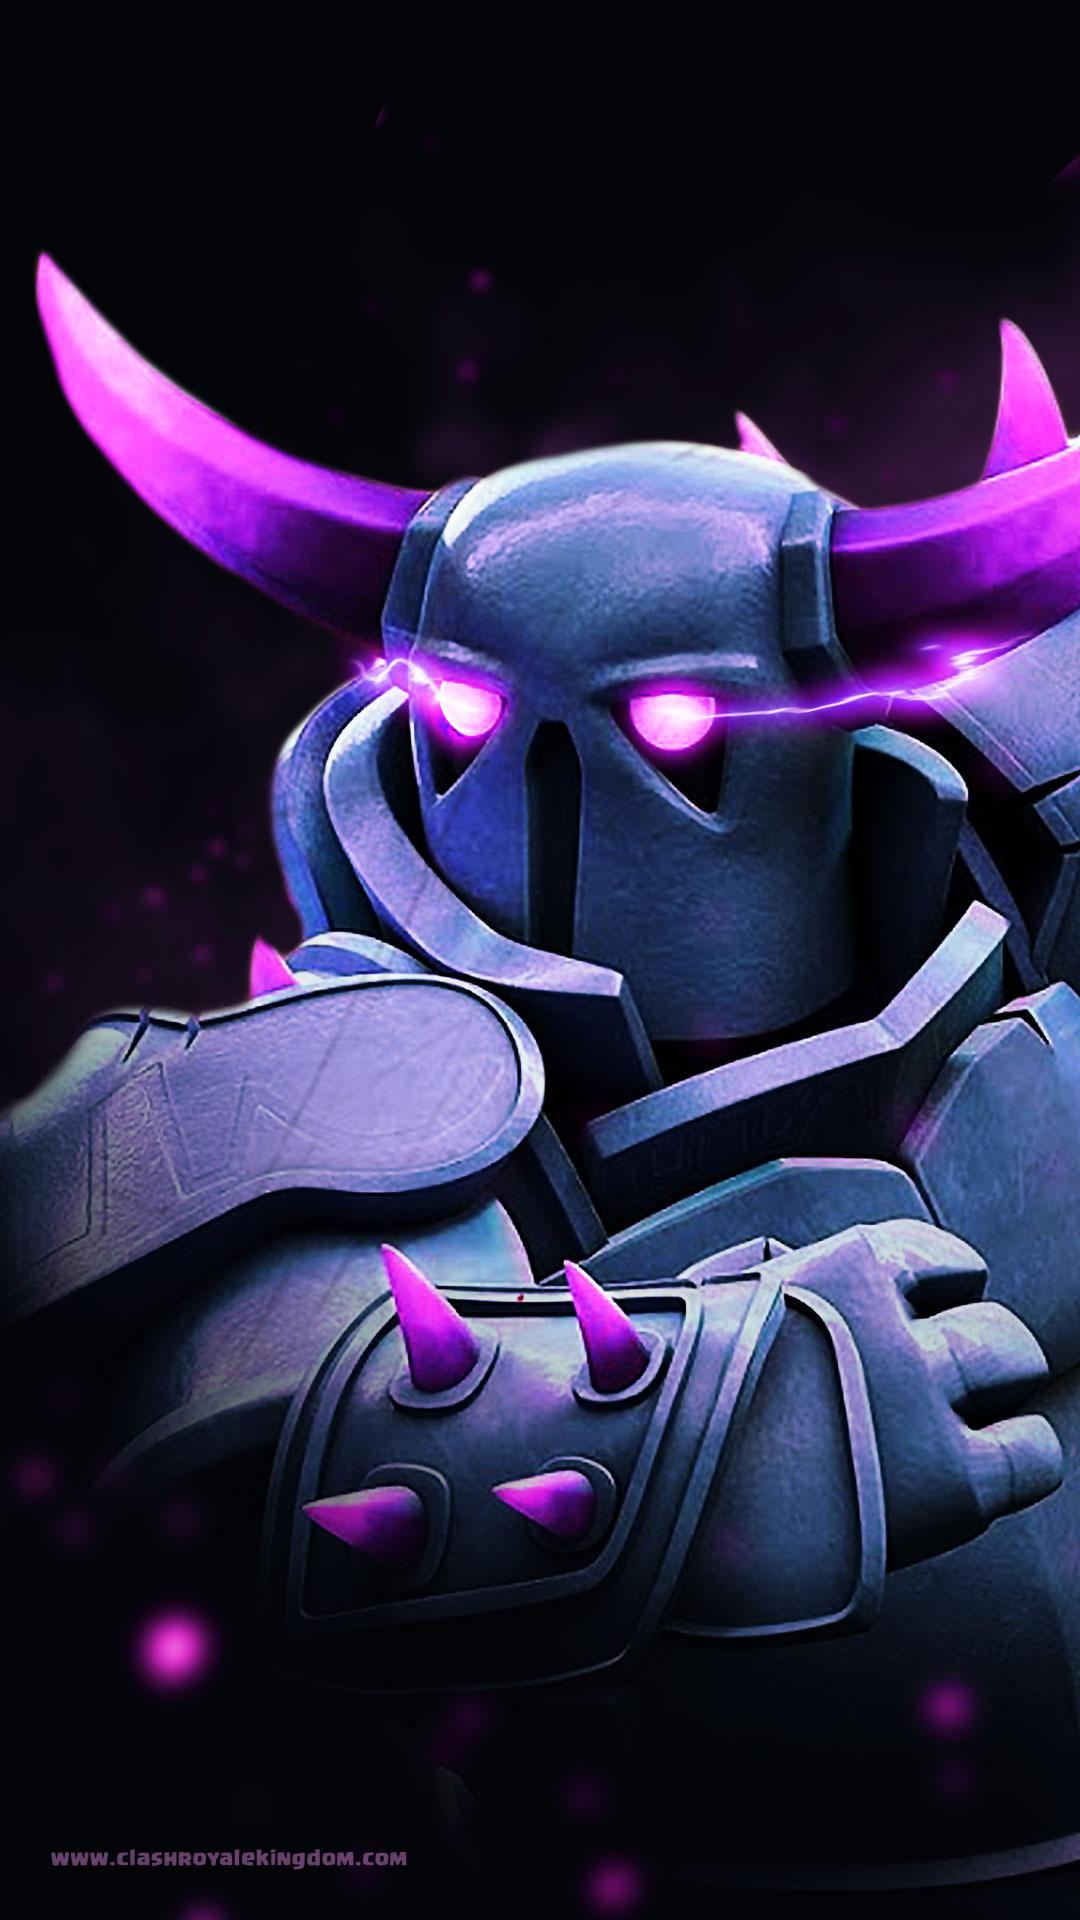 Pekka Zone Clash Royale Wallpaper Clash Royale Kingdom